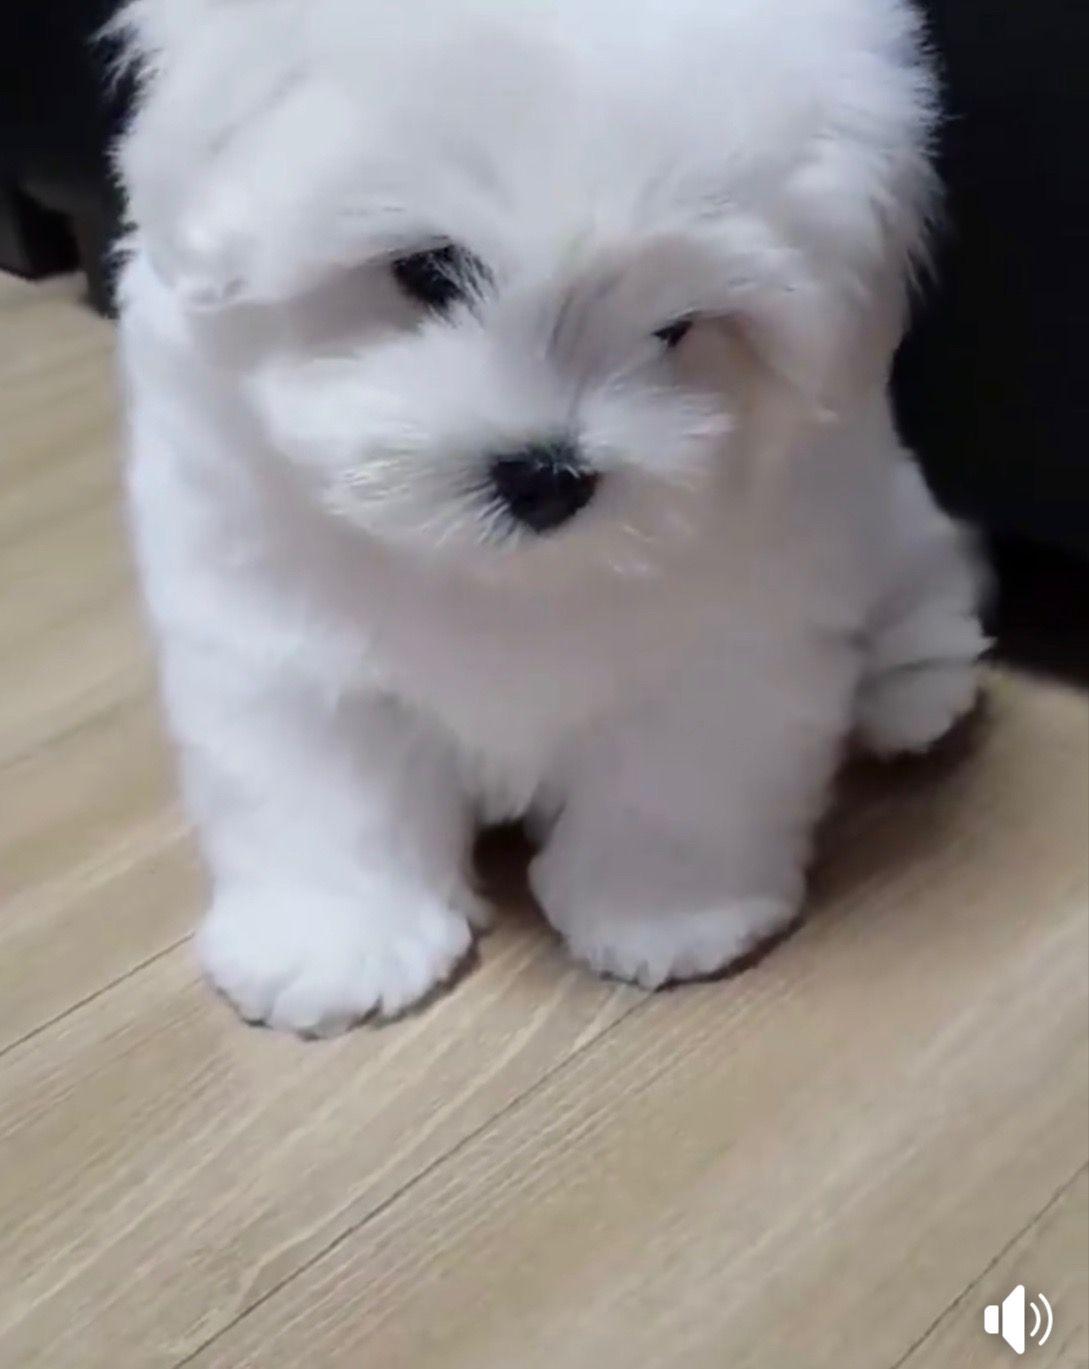 ˗ˏˋ theartofblushing ˎˊ˗ Cute animals, Cute dogs, Baby